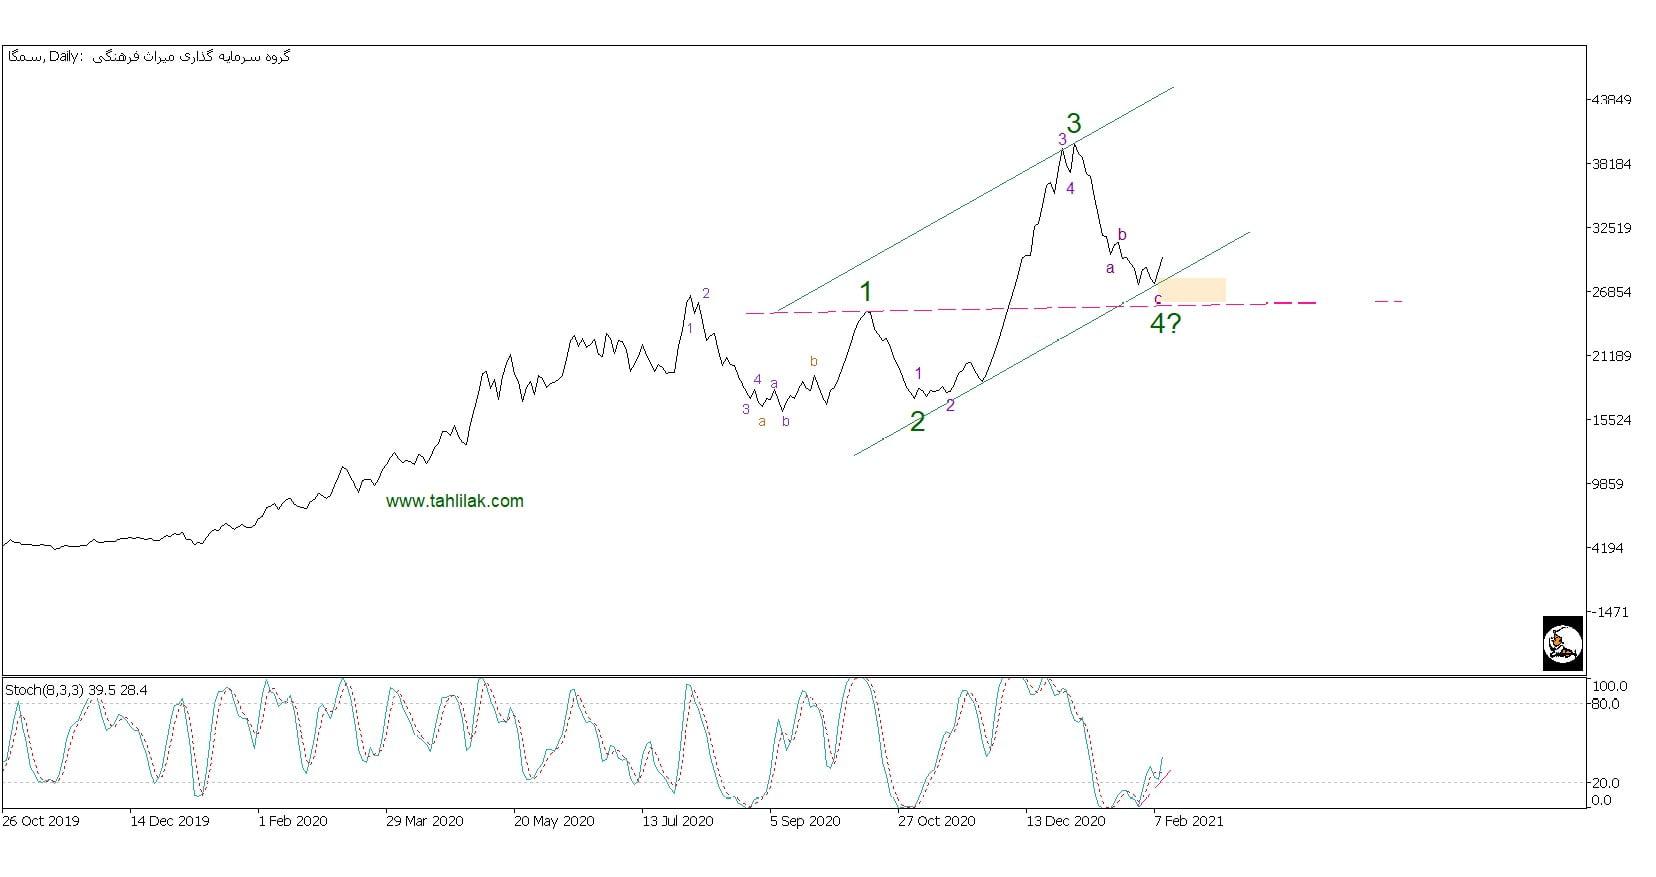 تحلیل تکنیکال سهام سمگا (گروه سرمايه گذاري ميراث فرهنگي)